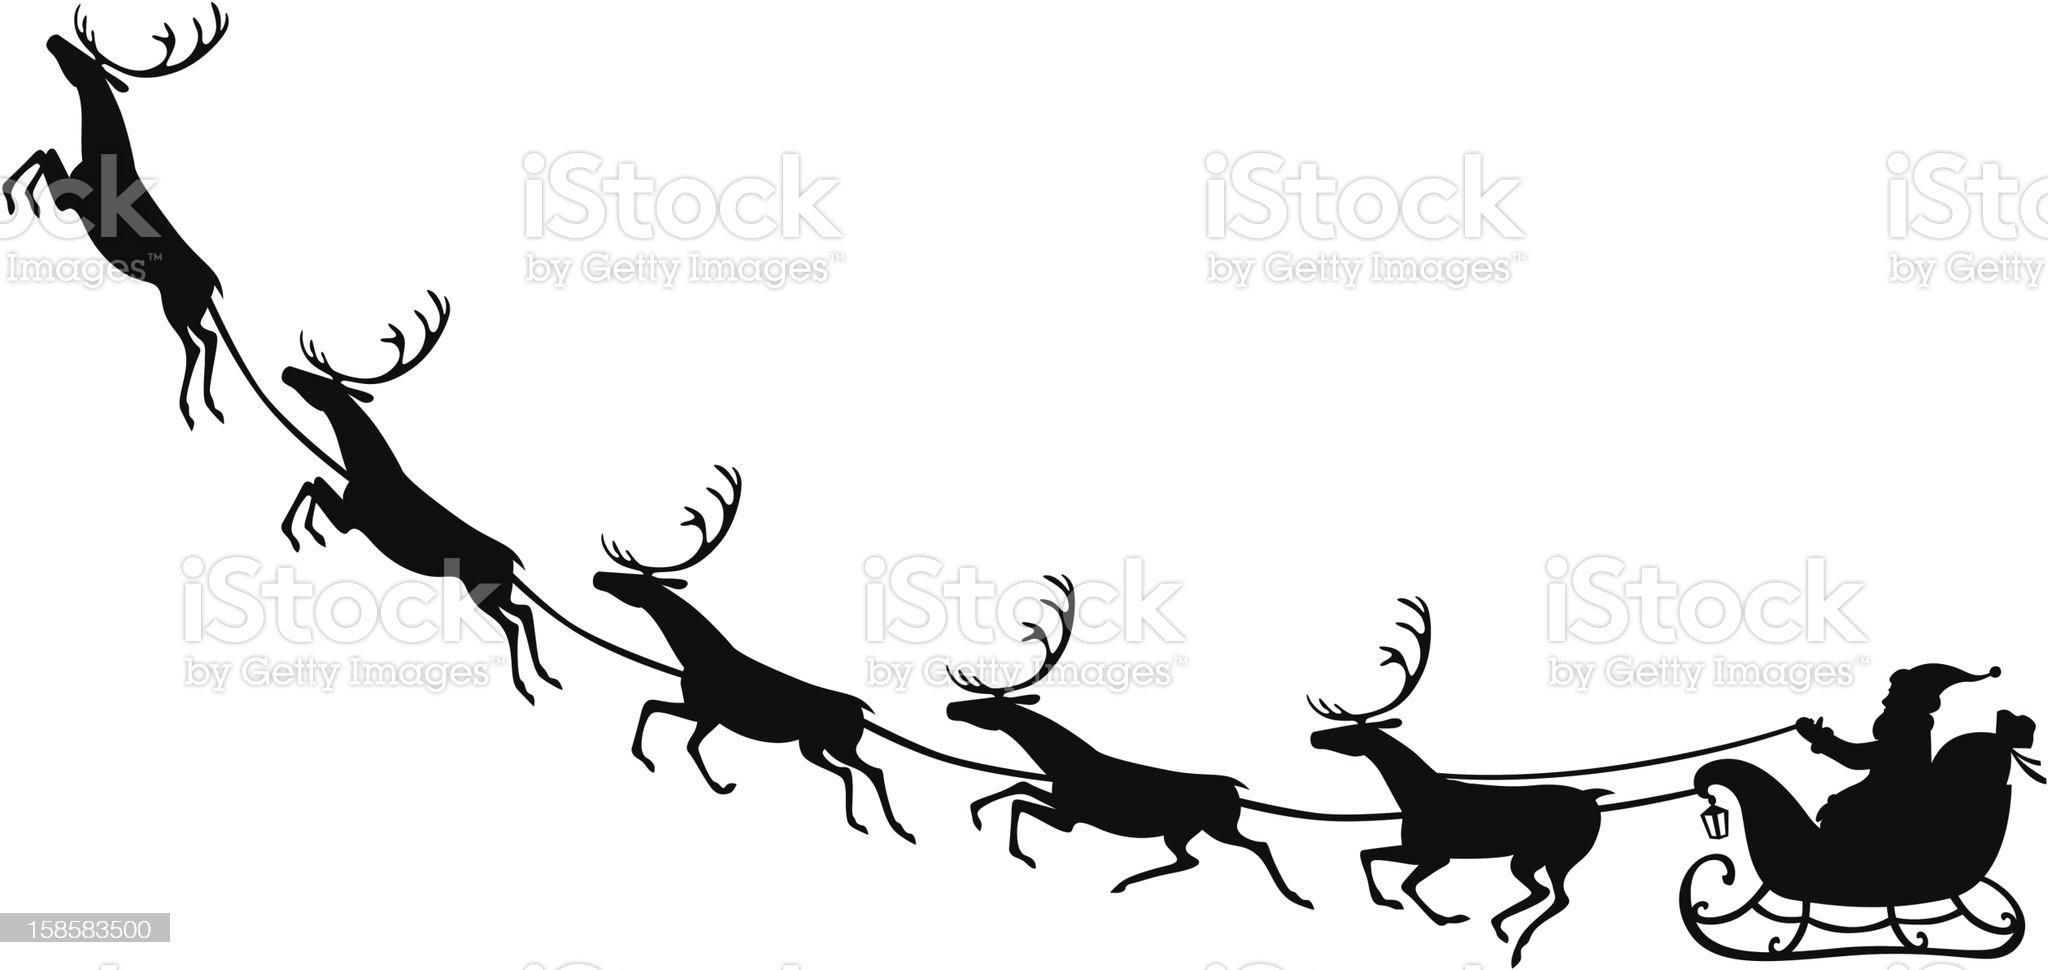 Santa Claus riding on a reindeer sleigh royalty-free stock vector art